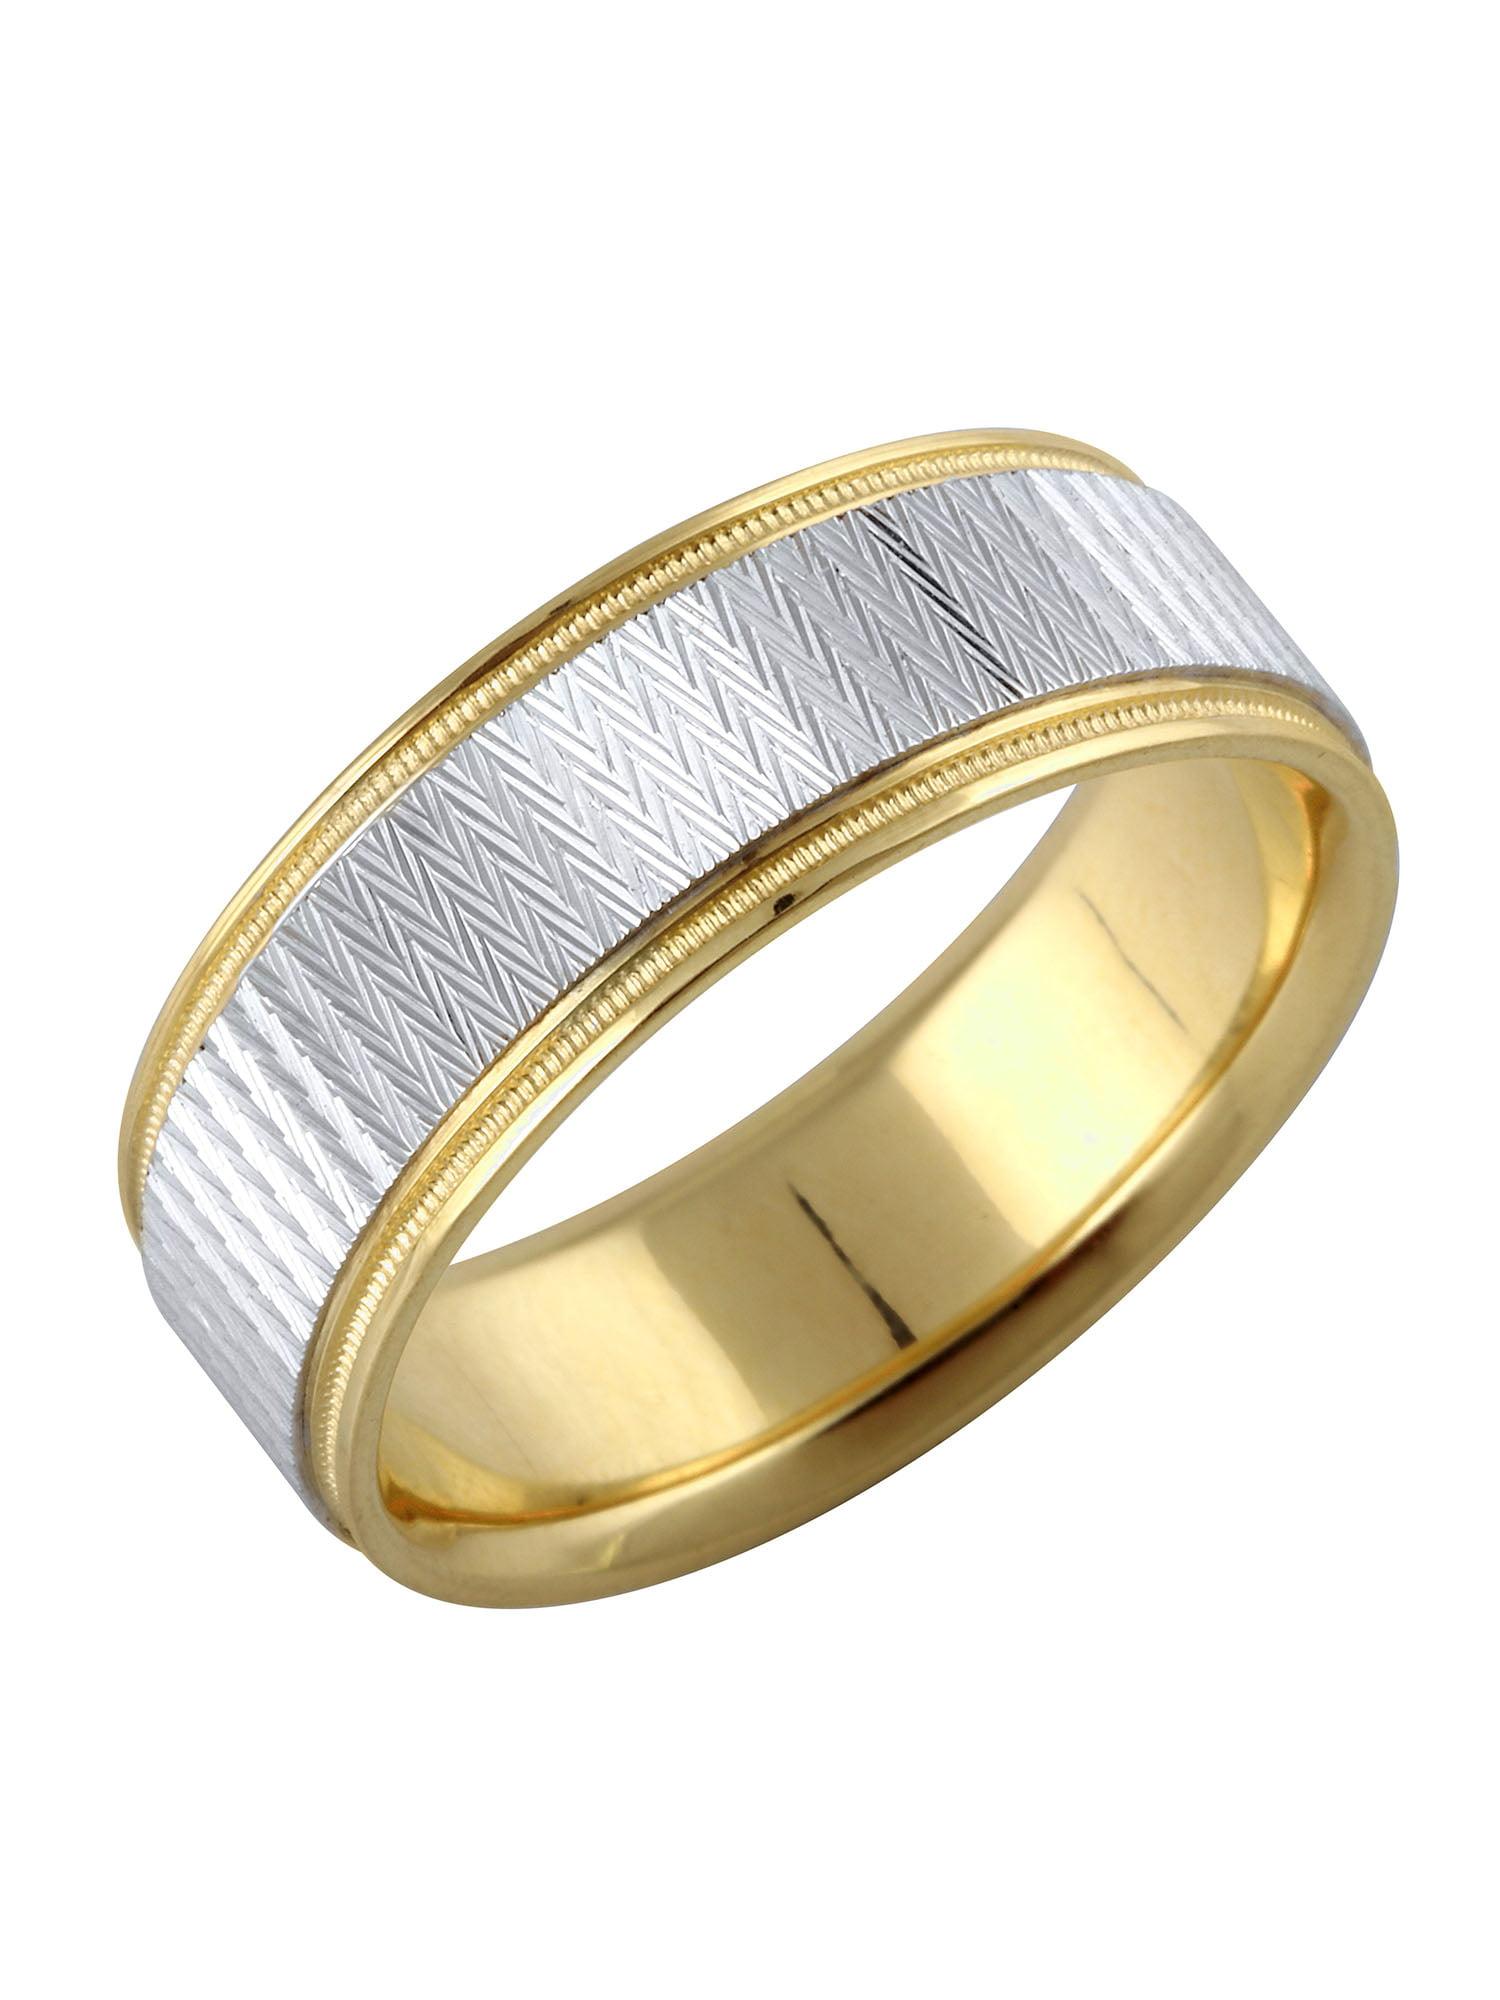 14K Yellow + White Gold Textured Metal Solid Men's Ring